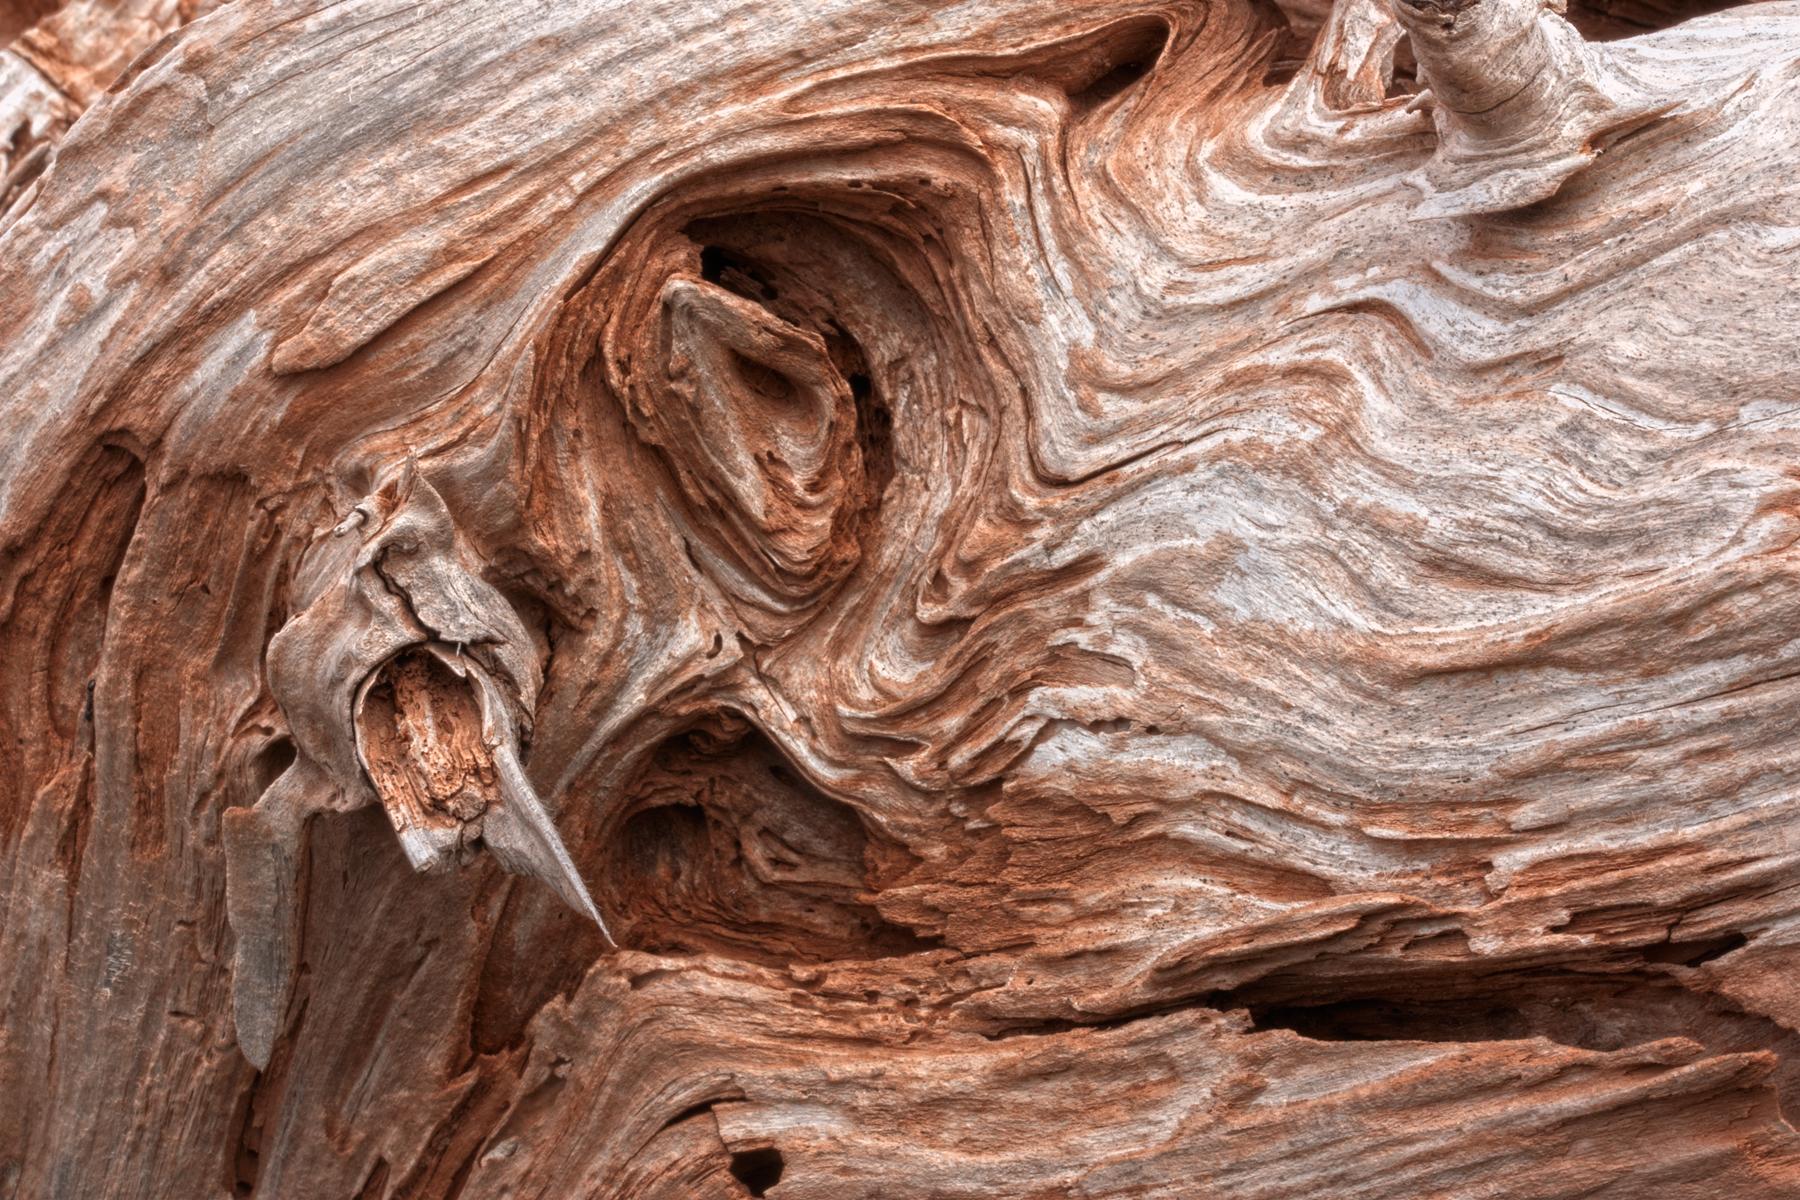 Cracked beachwood texture - hdr photo